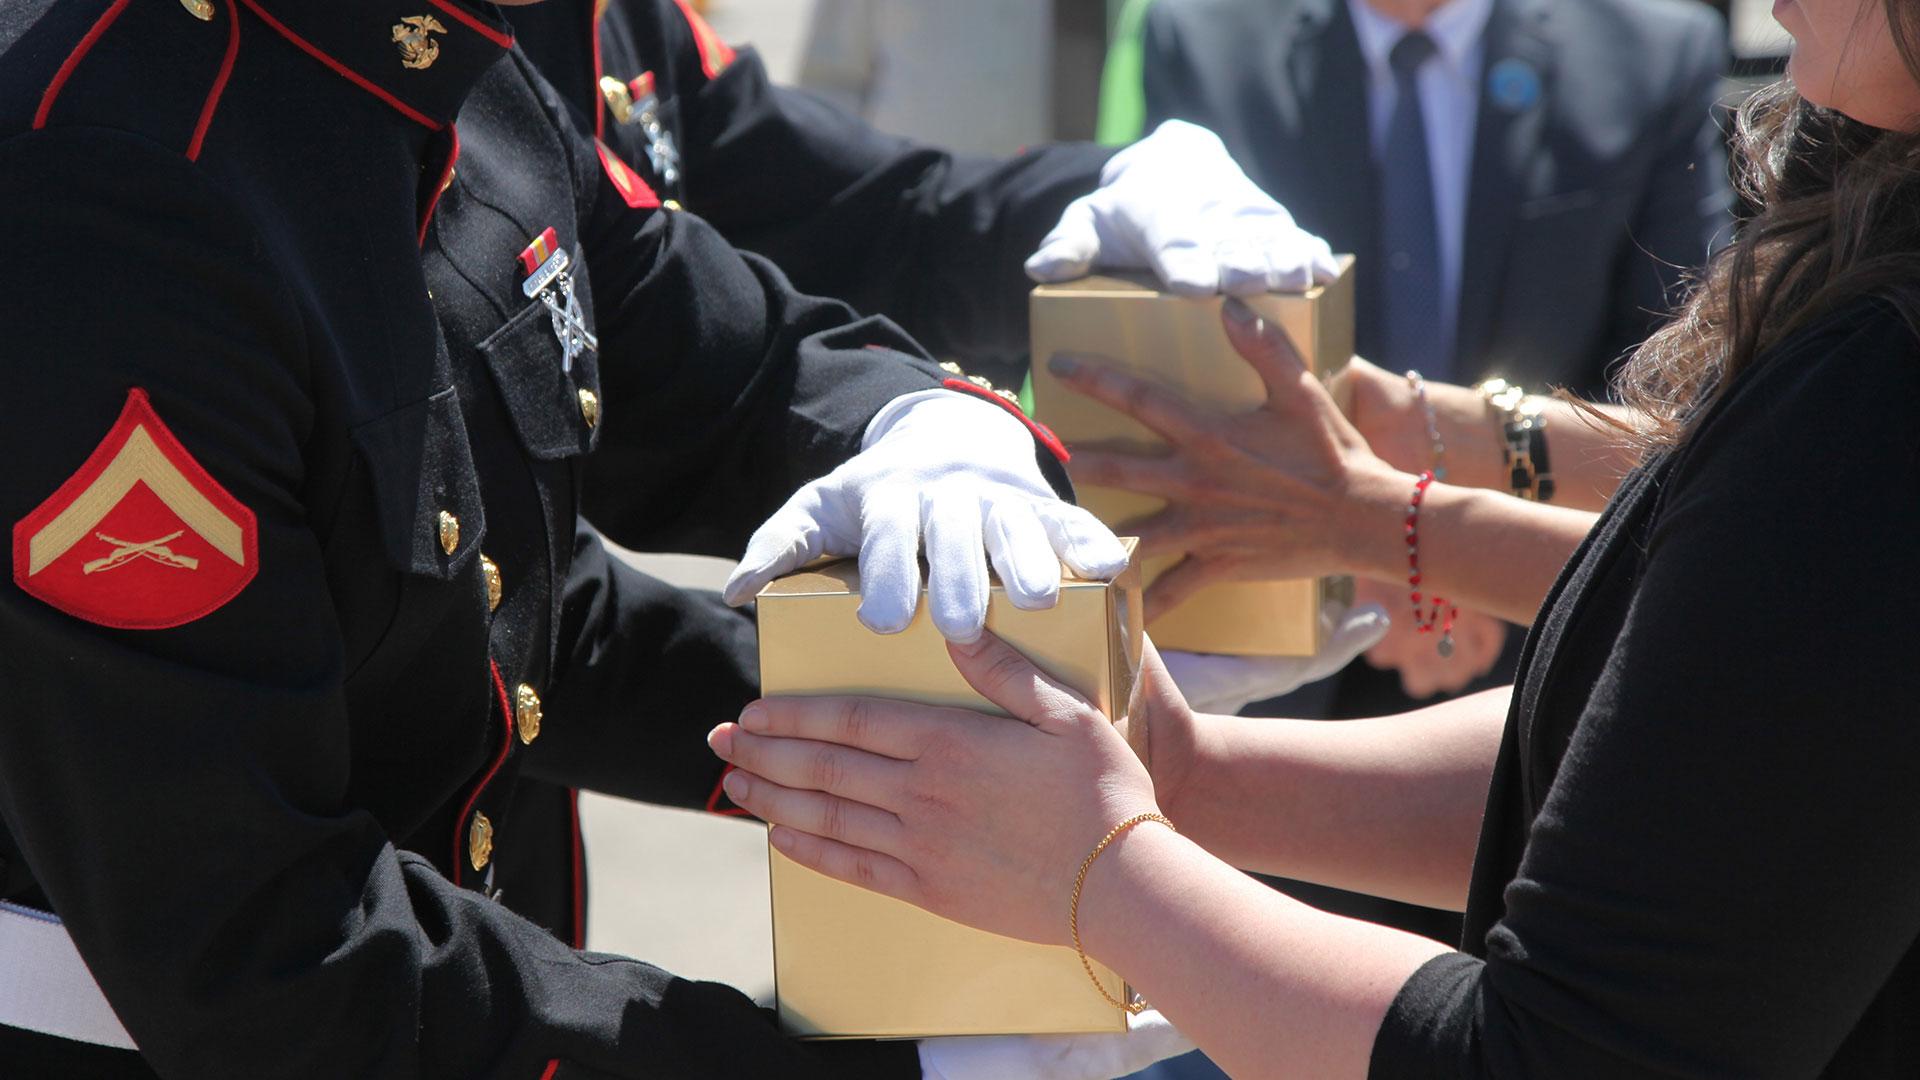 Urn handoff veterans hero